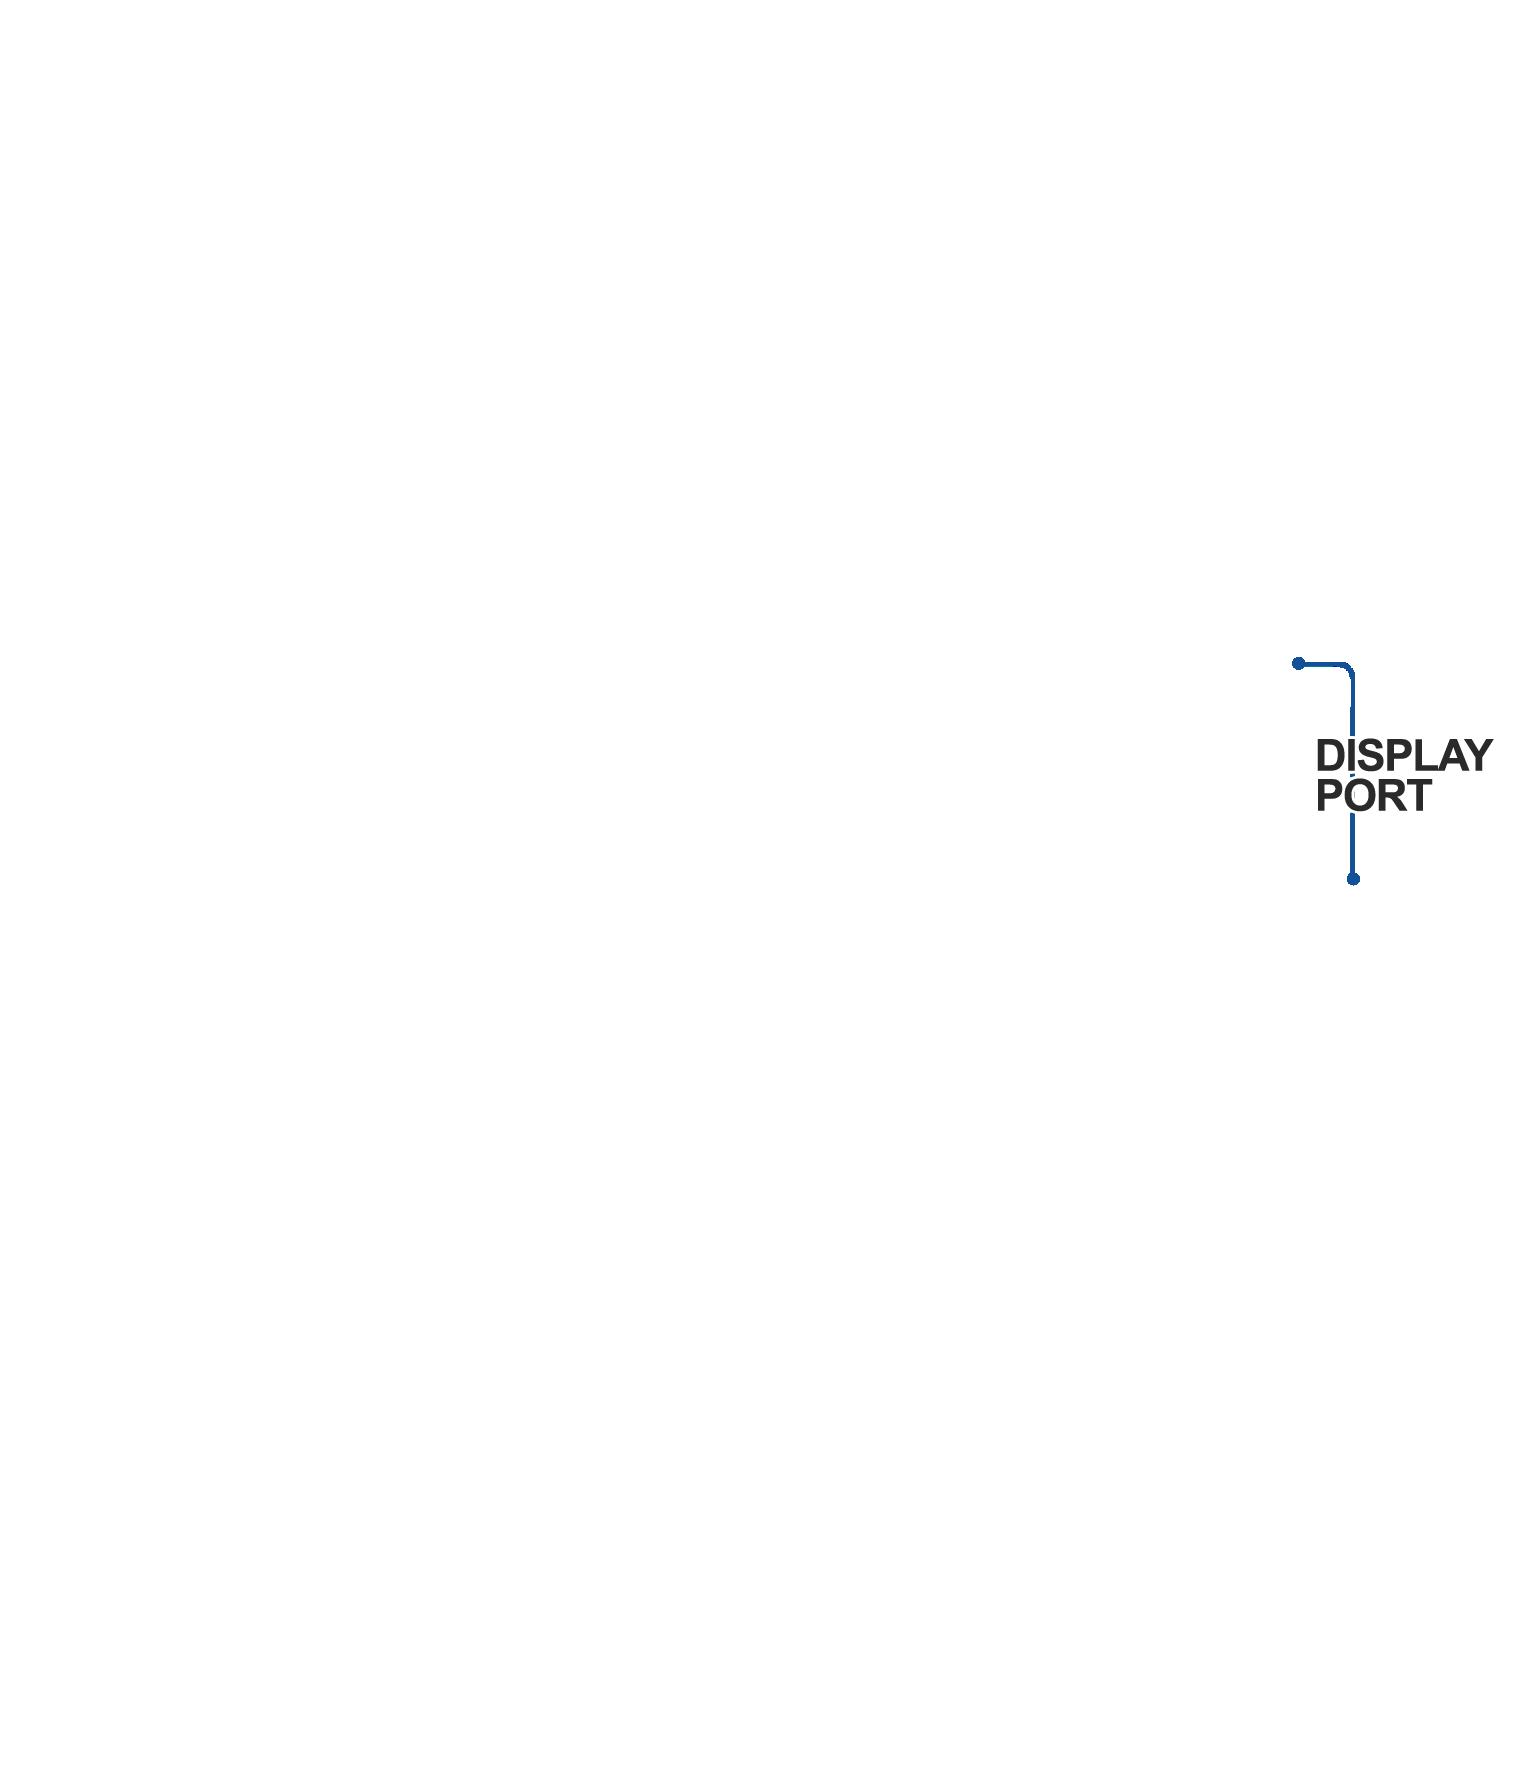 DISPLAY PORT, 모니터와 데스크탑을 이어주는 선